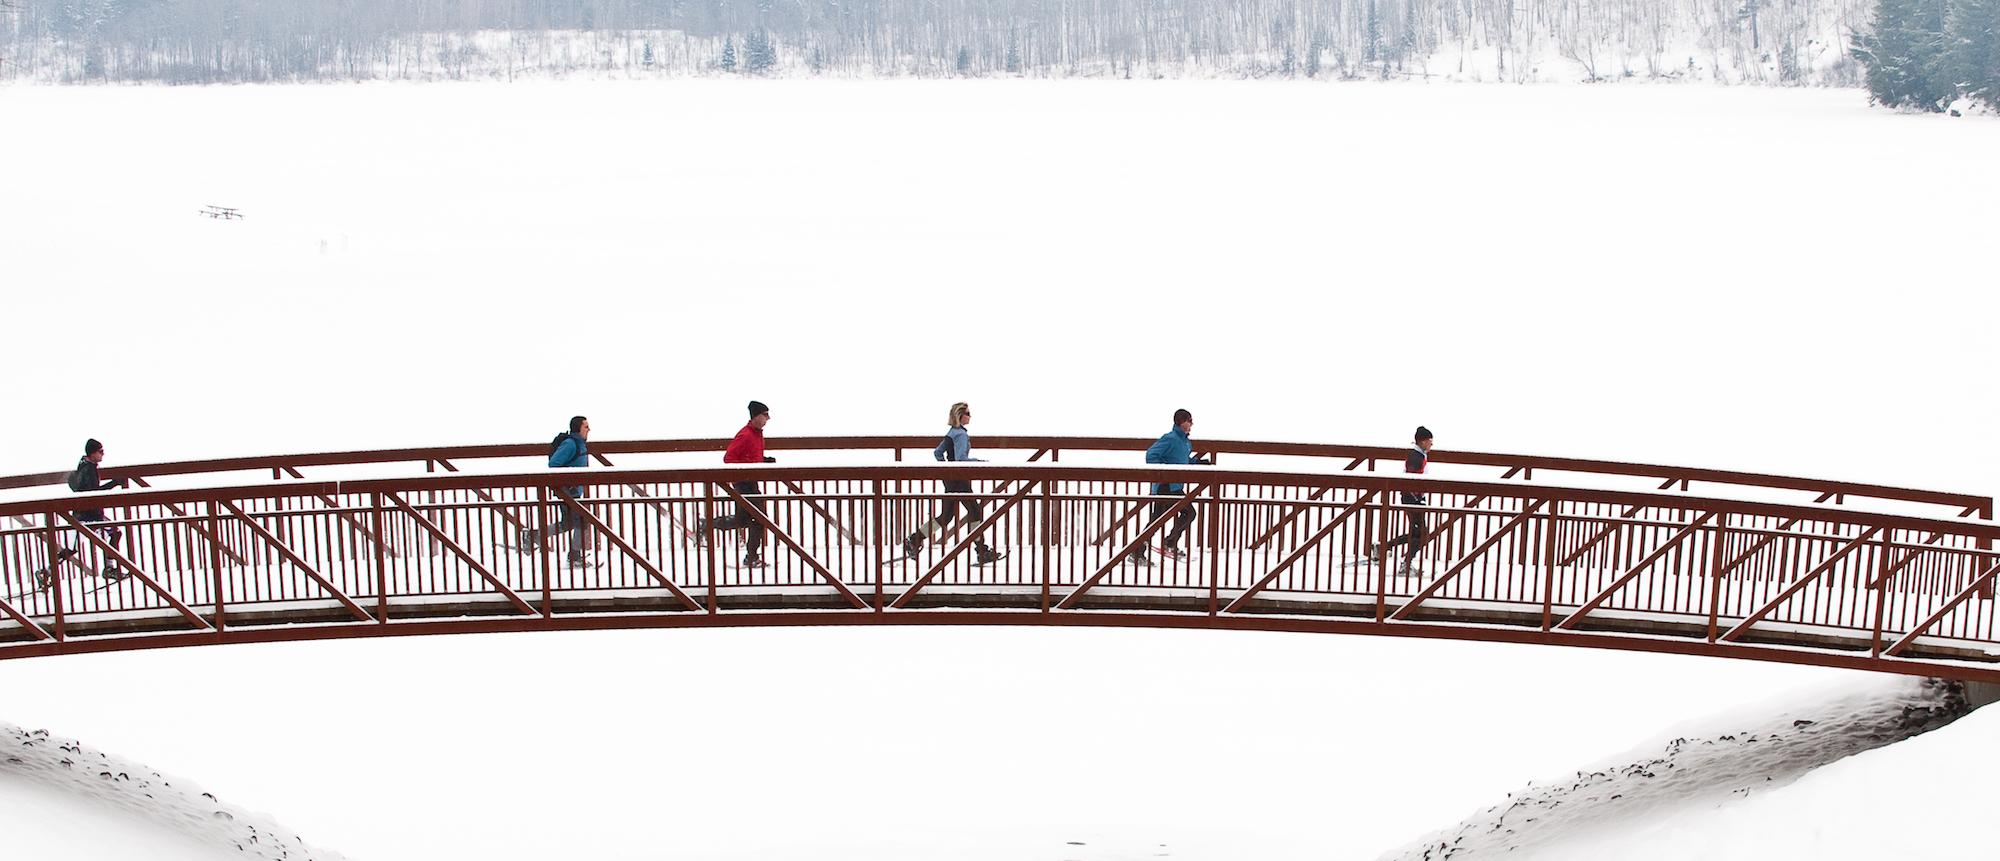 Snowshoeing at Arrowhead Park